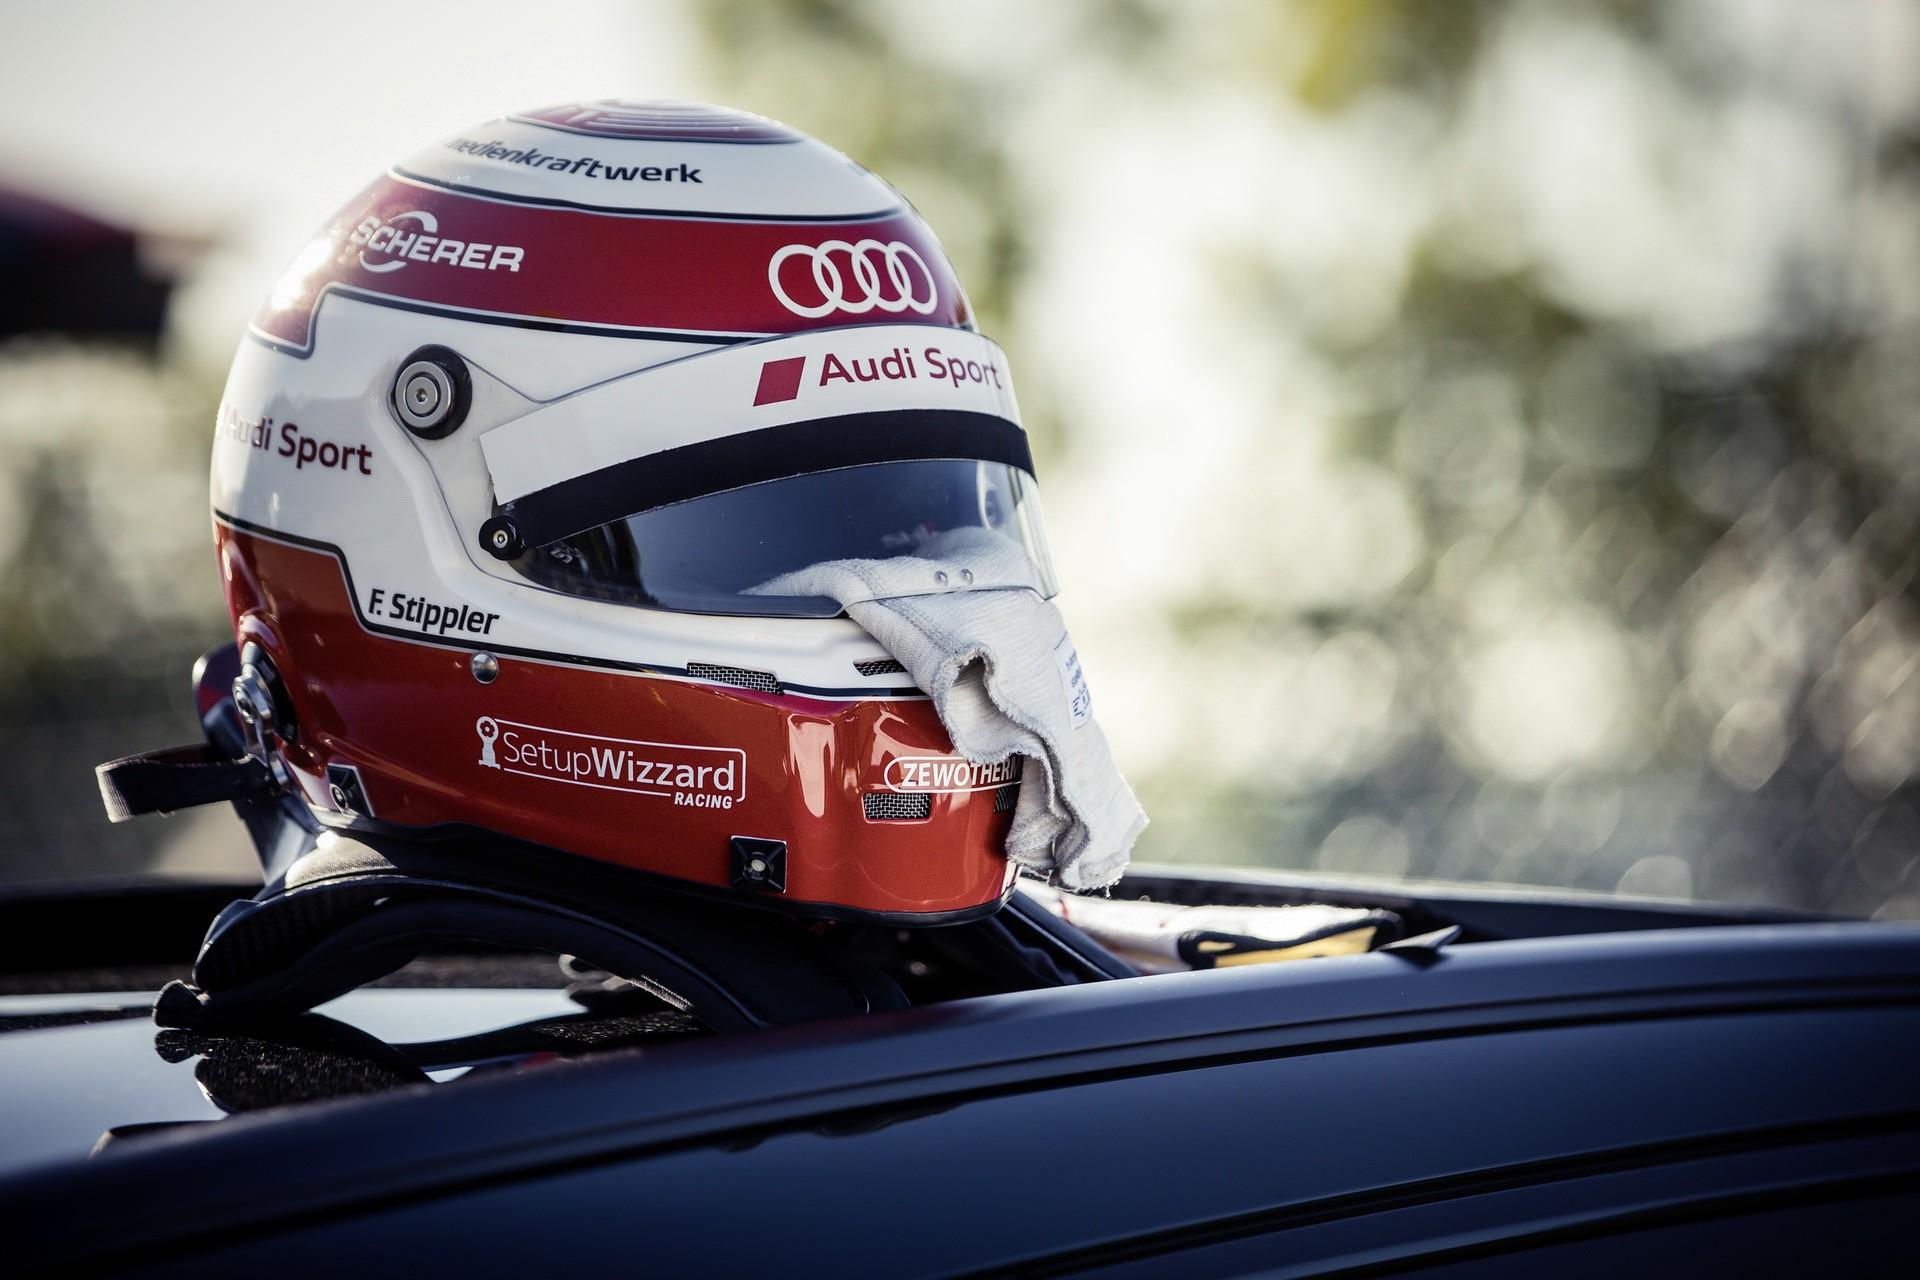 Audi_RS3_Sedan_Nurburgring_lap_record-0008